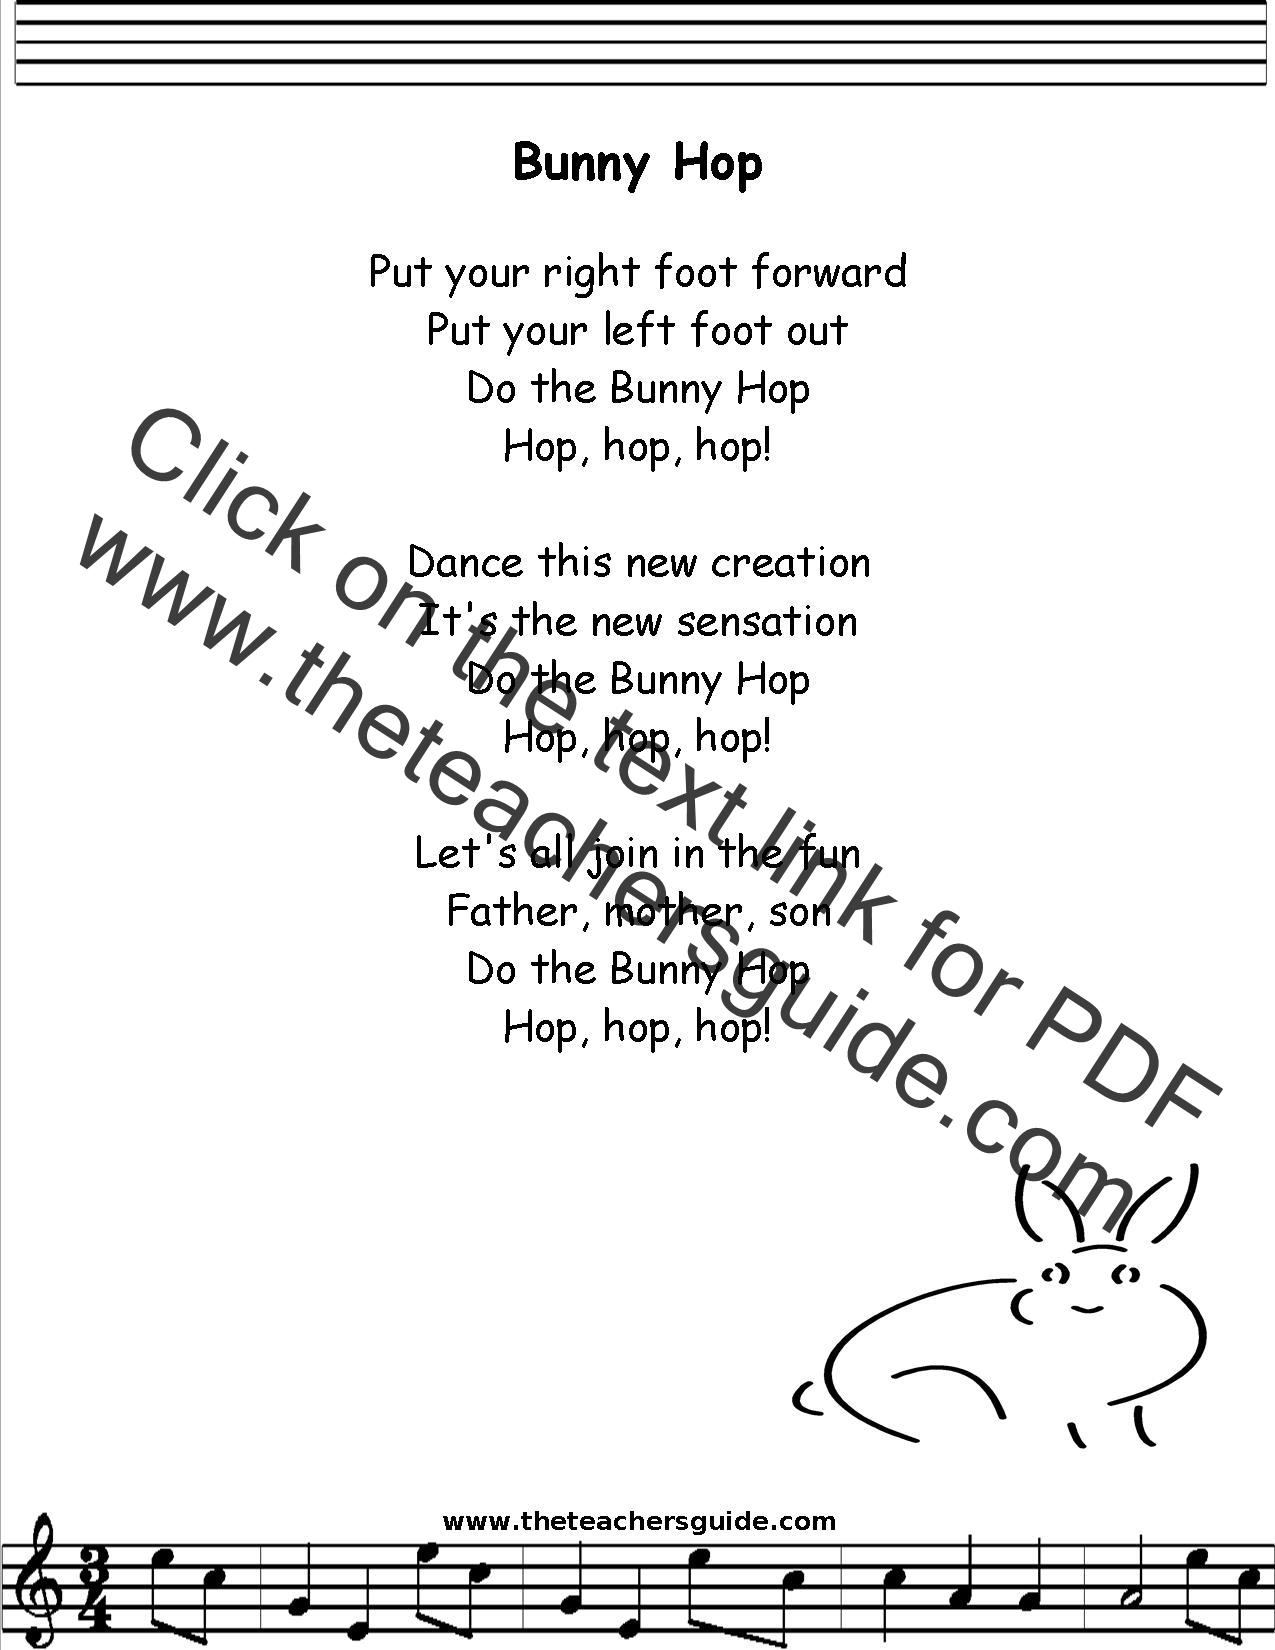 Bunny Hop Lyrics Printout Midi And Video